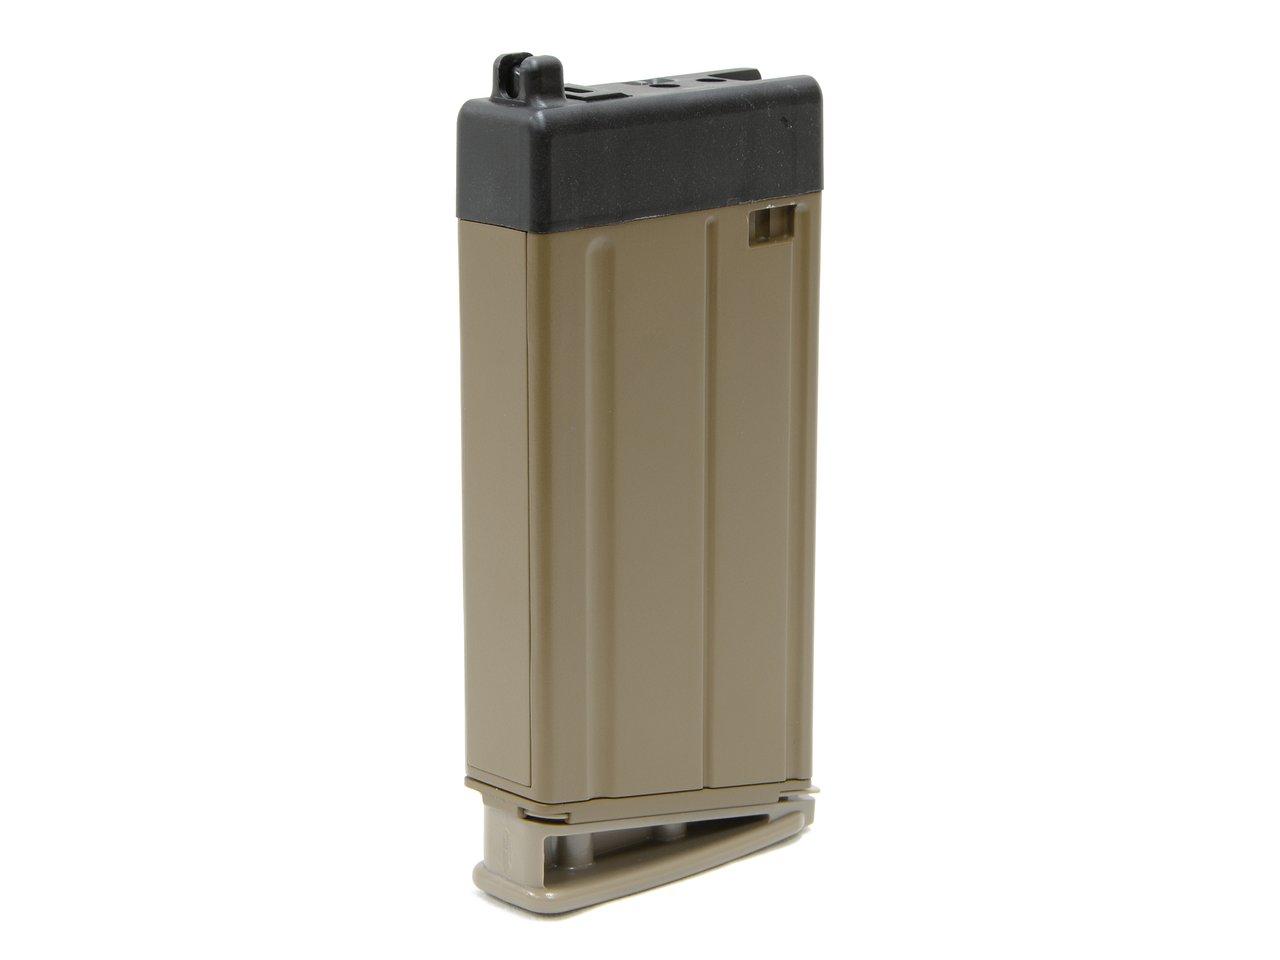 CyberGun FN SCAR-H GBBR用24連スペアマガジン (FDE) [VFC OEM]